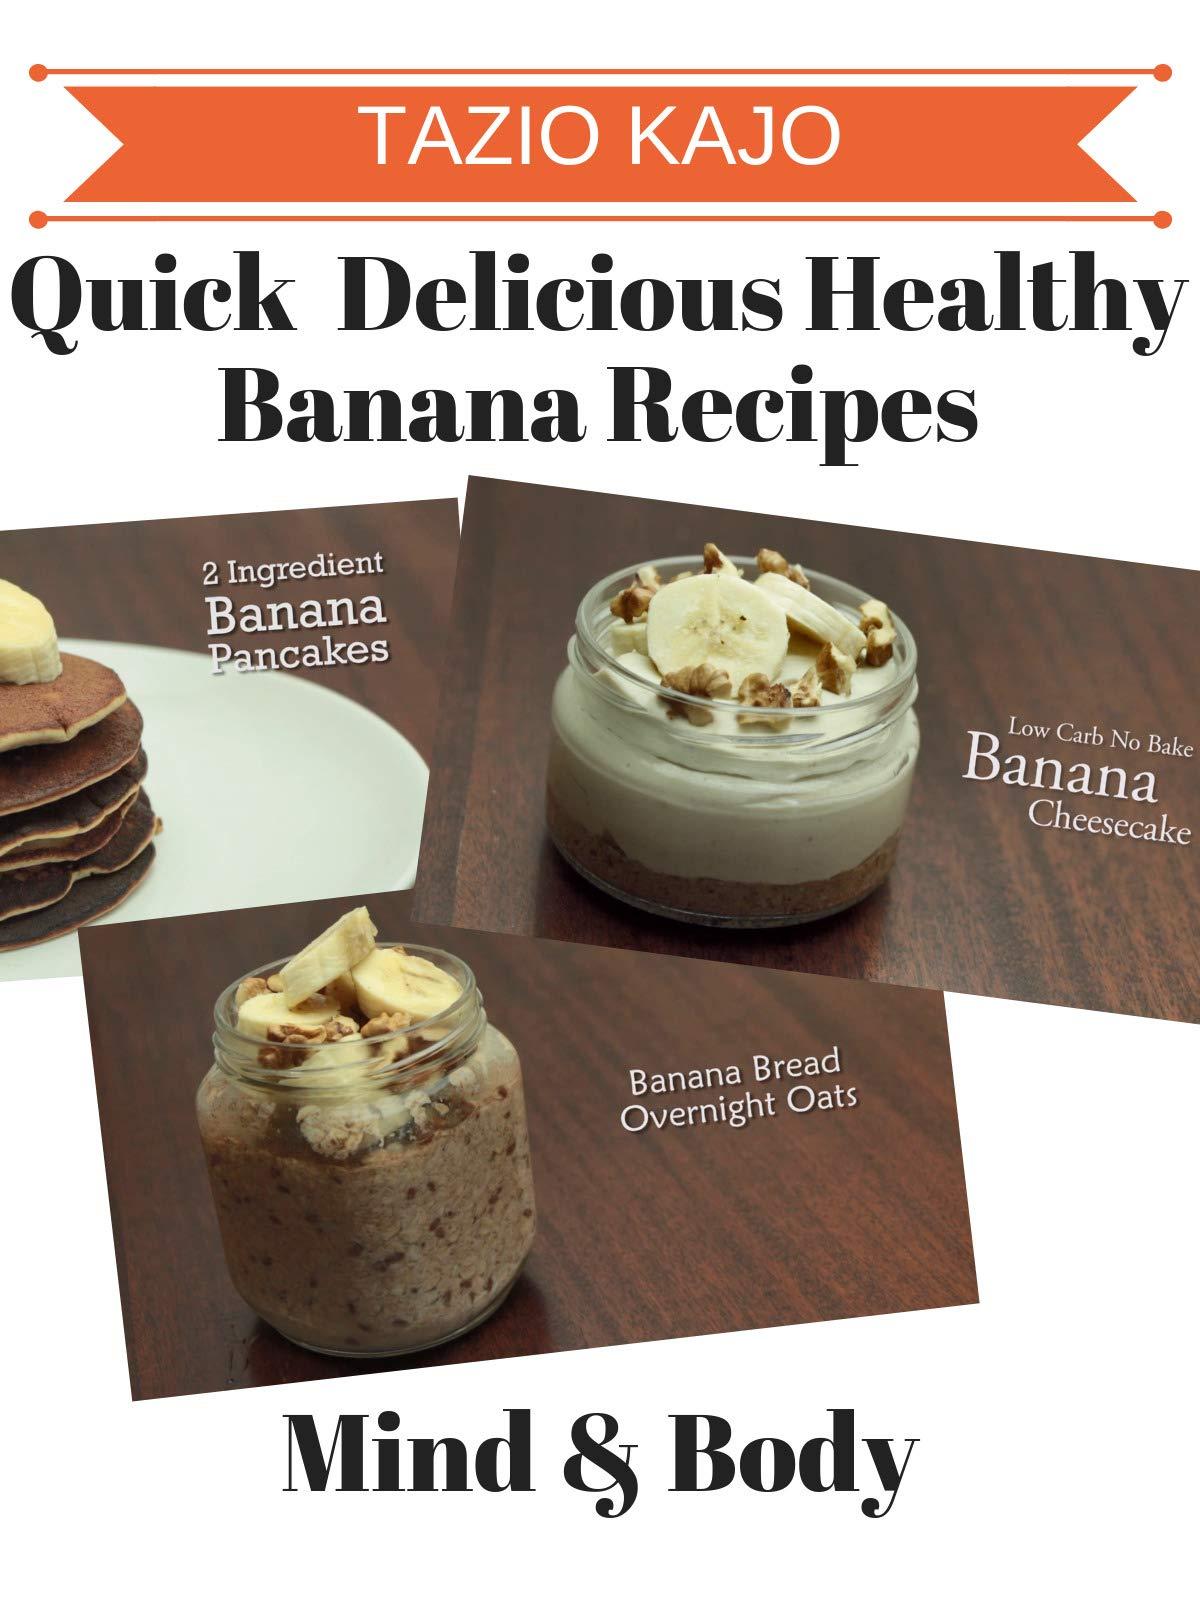 Quick & Delicious Healthy Banana Recipes